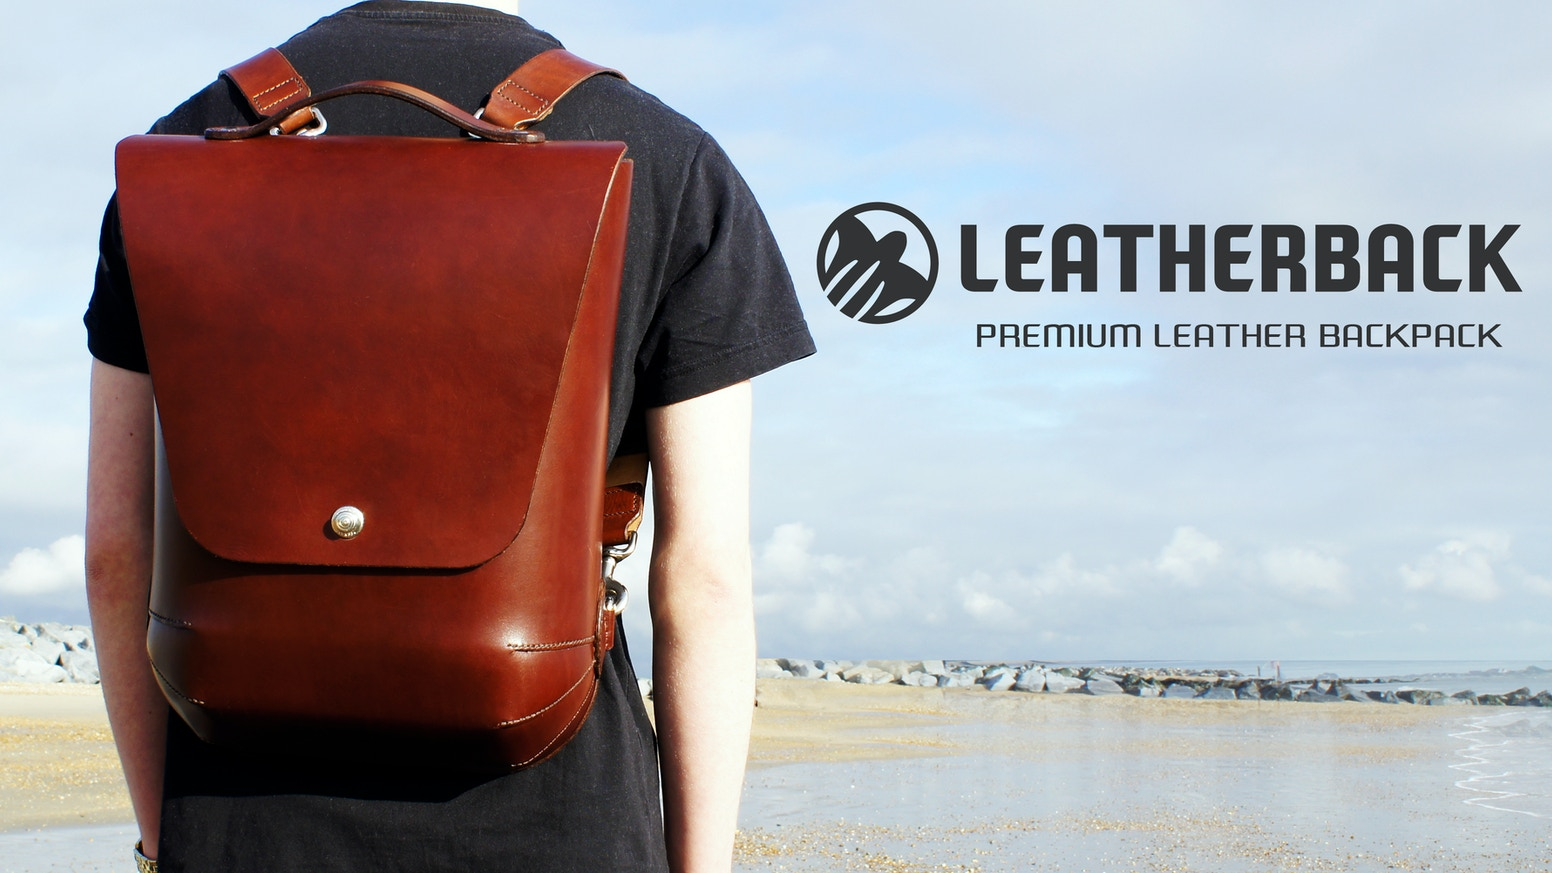 ef5e2b9991b7 The Leatherback Leather Backpack. Quality